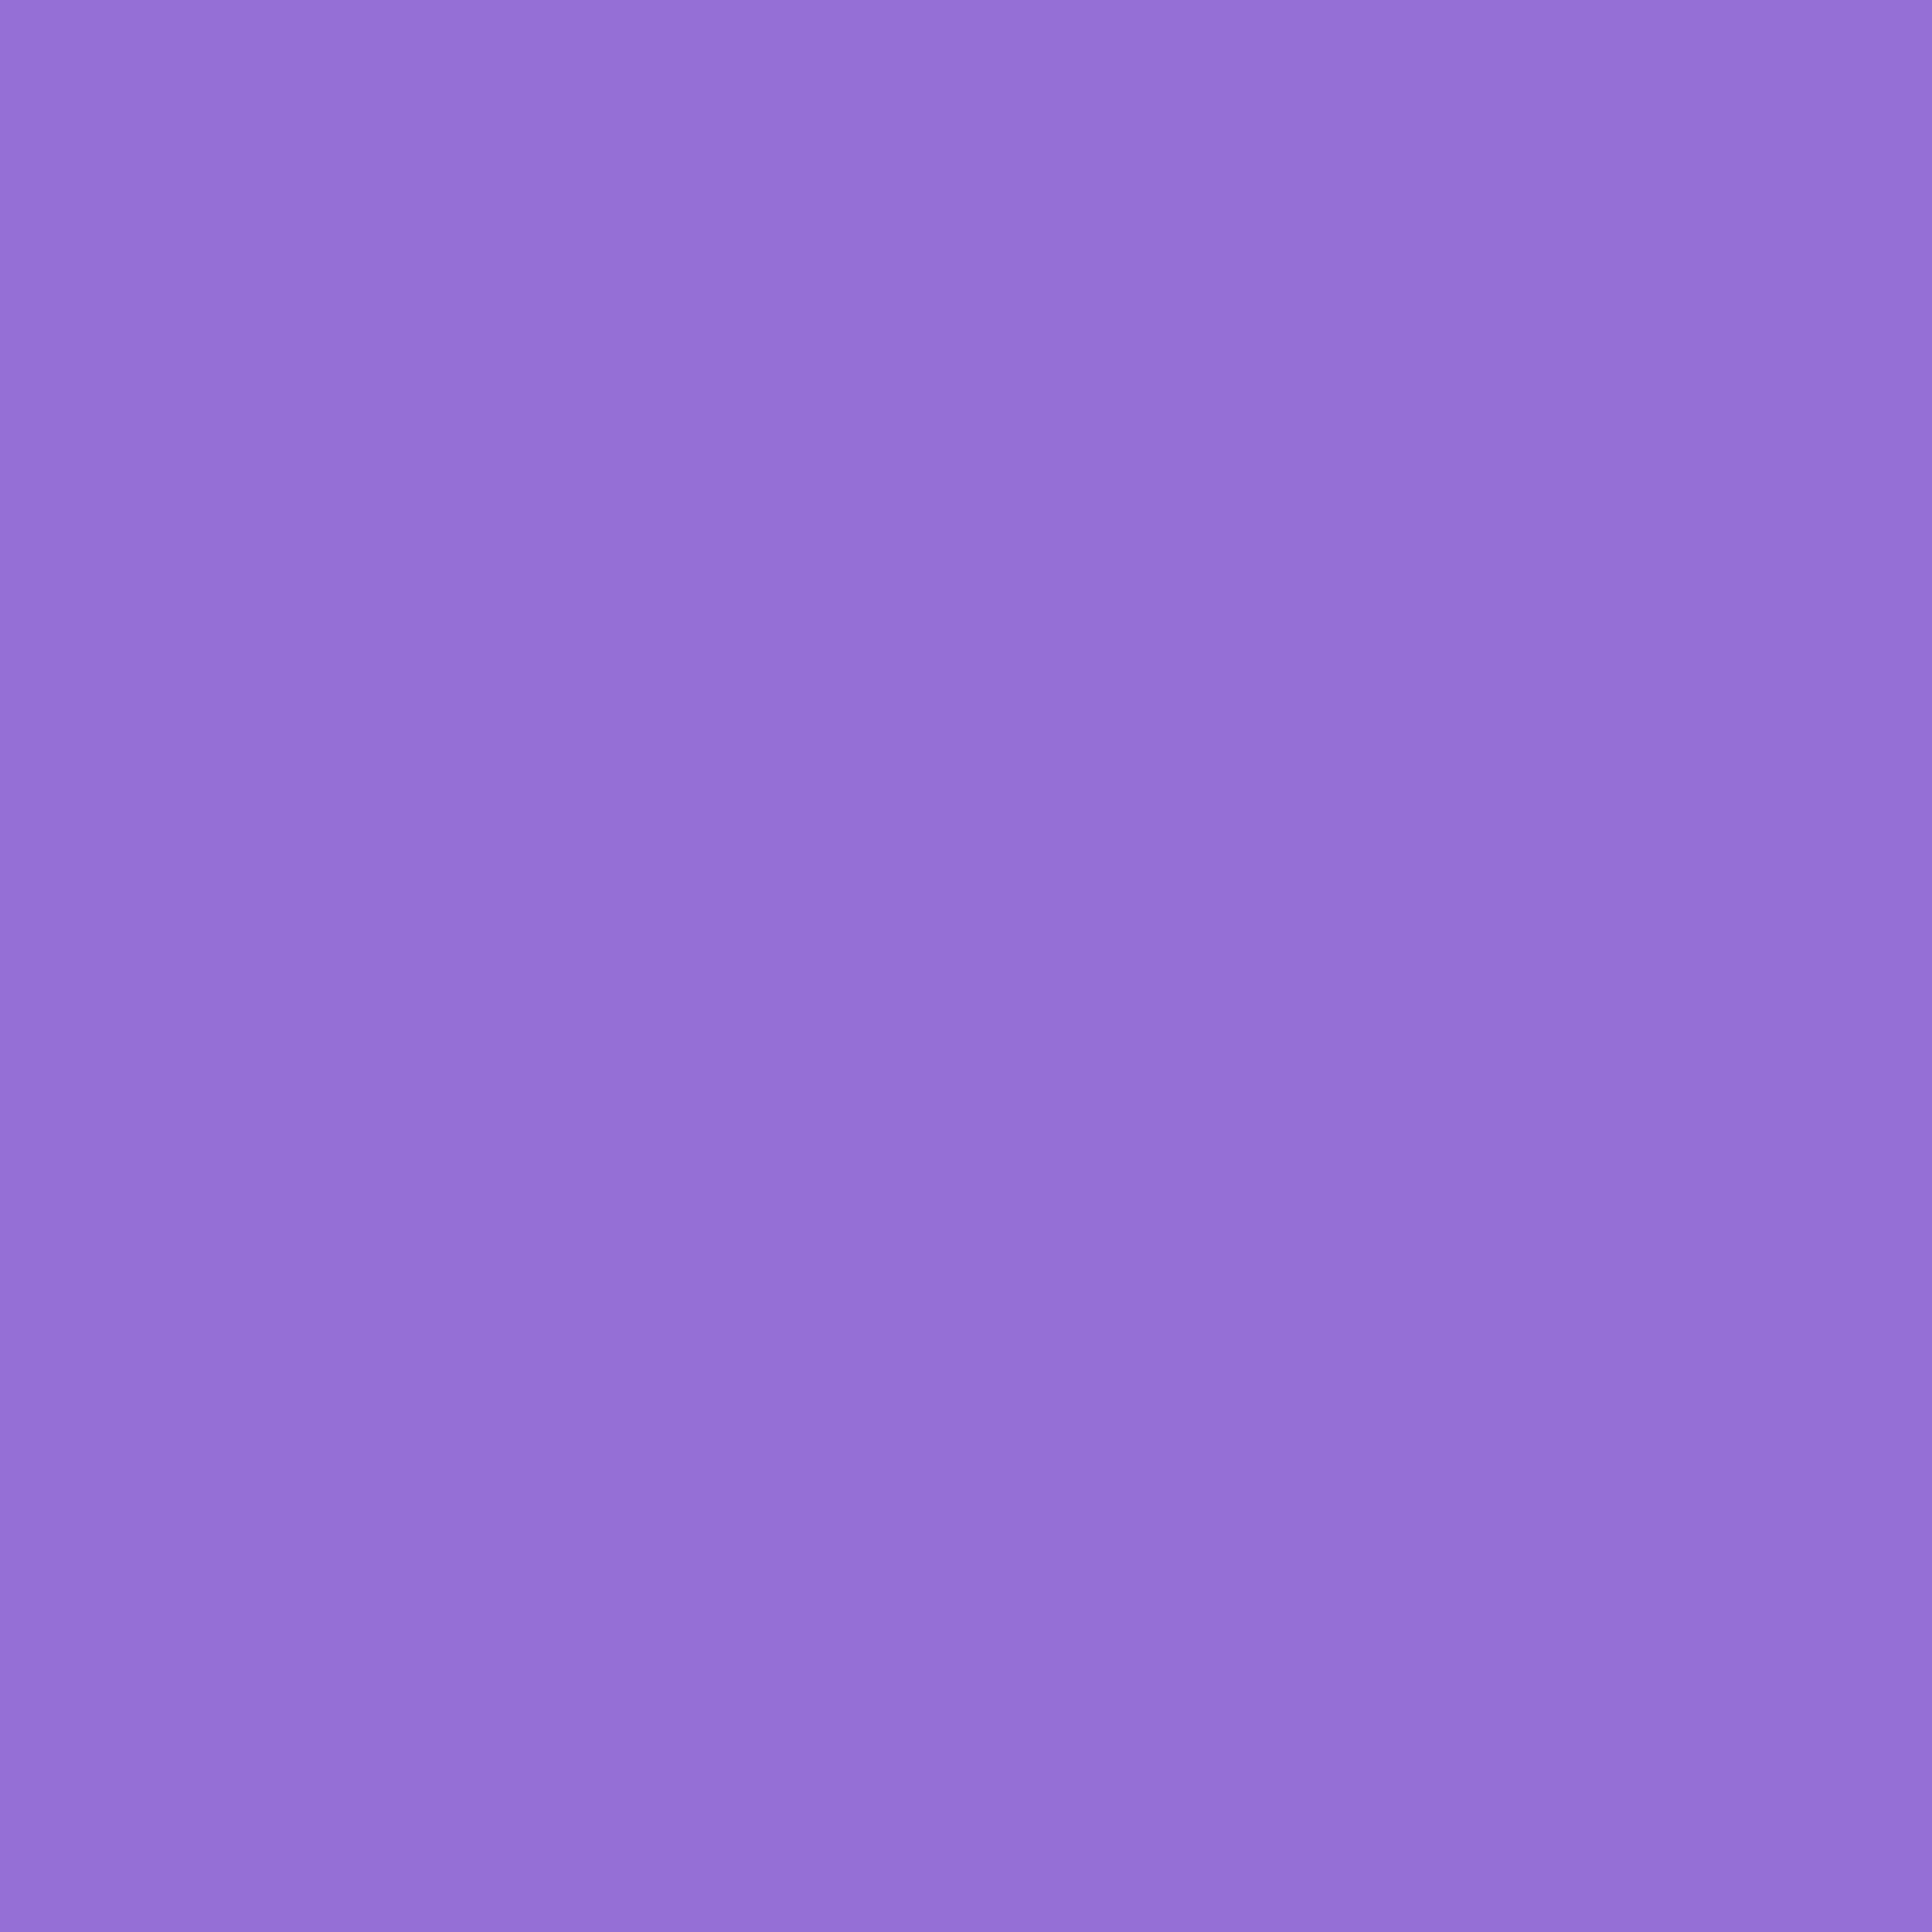 2732x2732 Dark Pastel Purple Solid Color Background